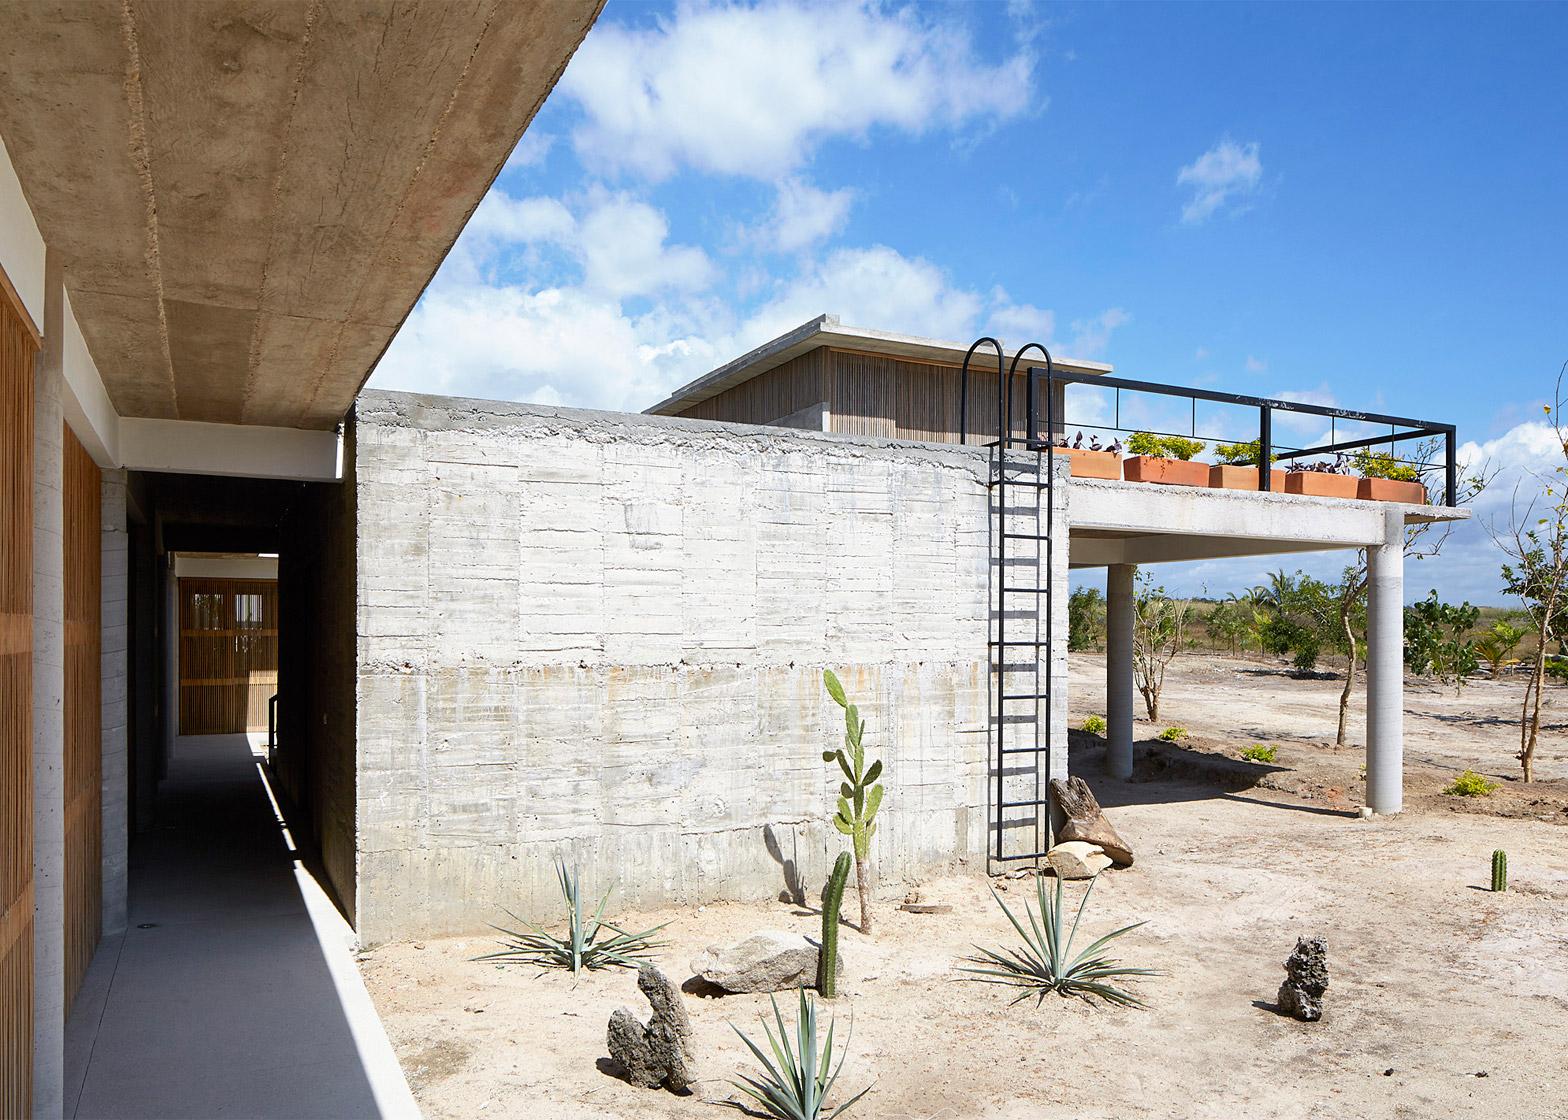 Baaq House by Alfonso Qunones